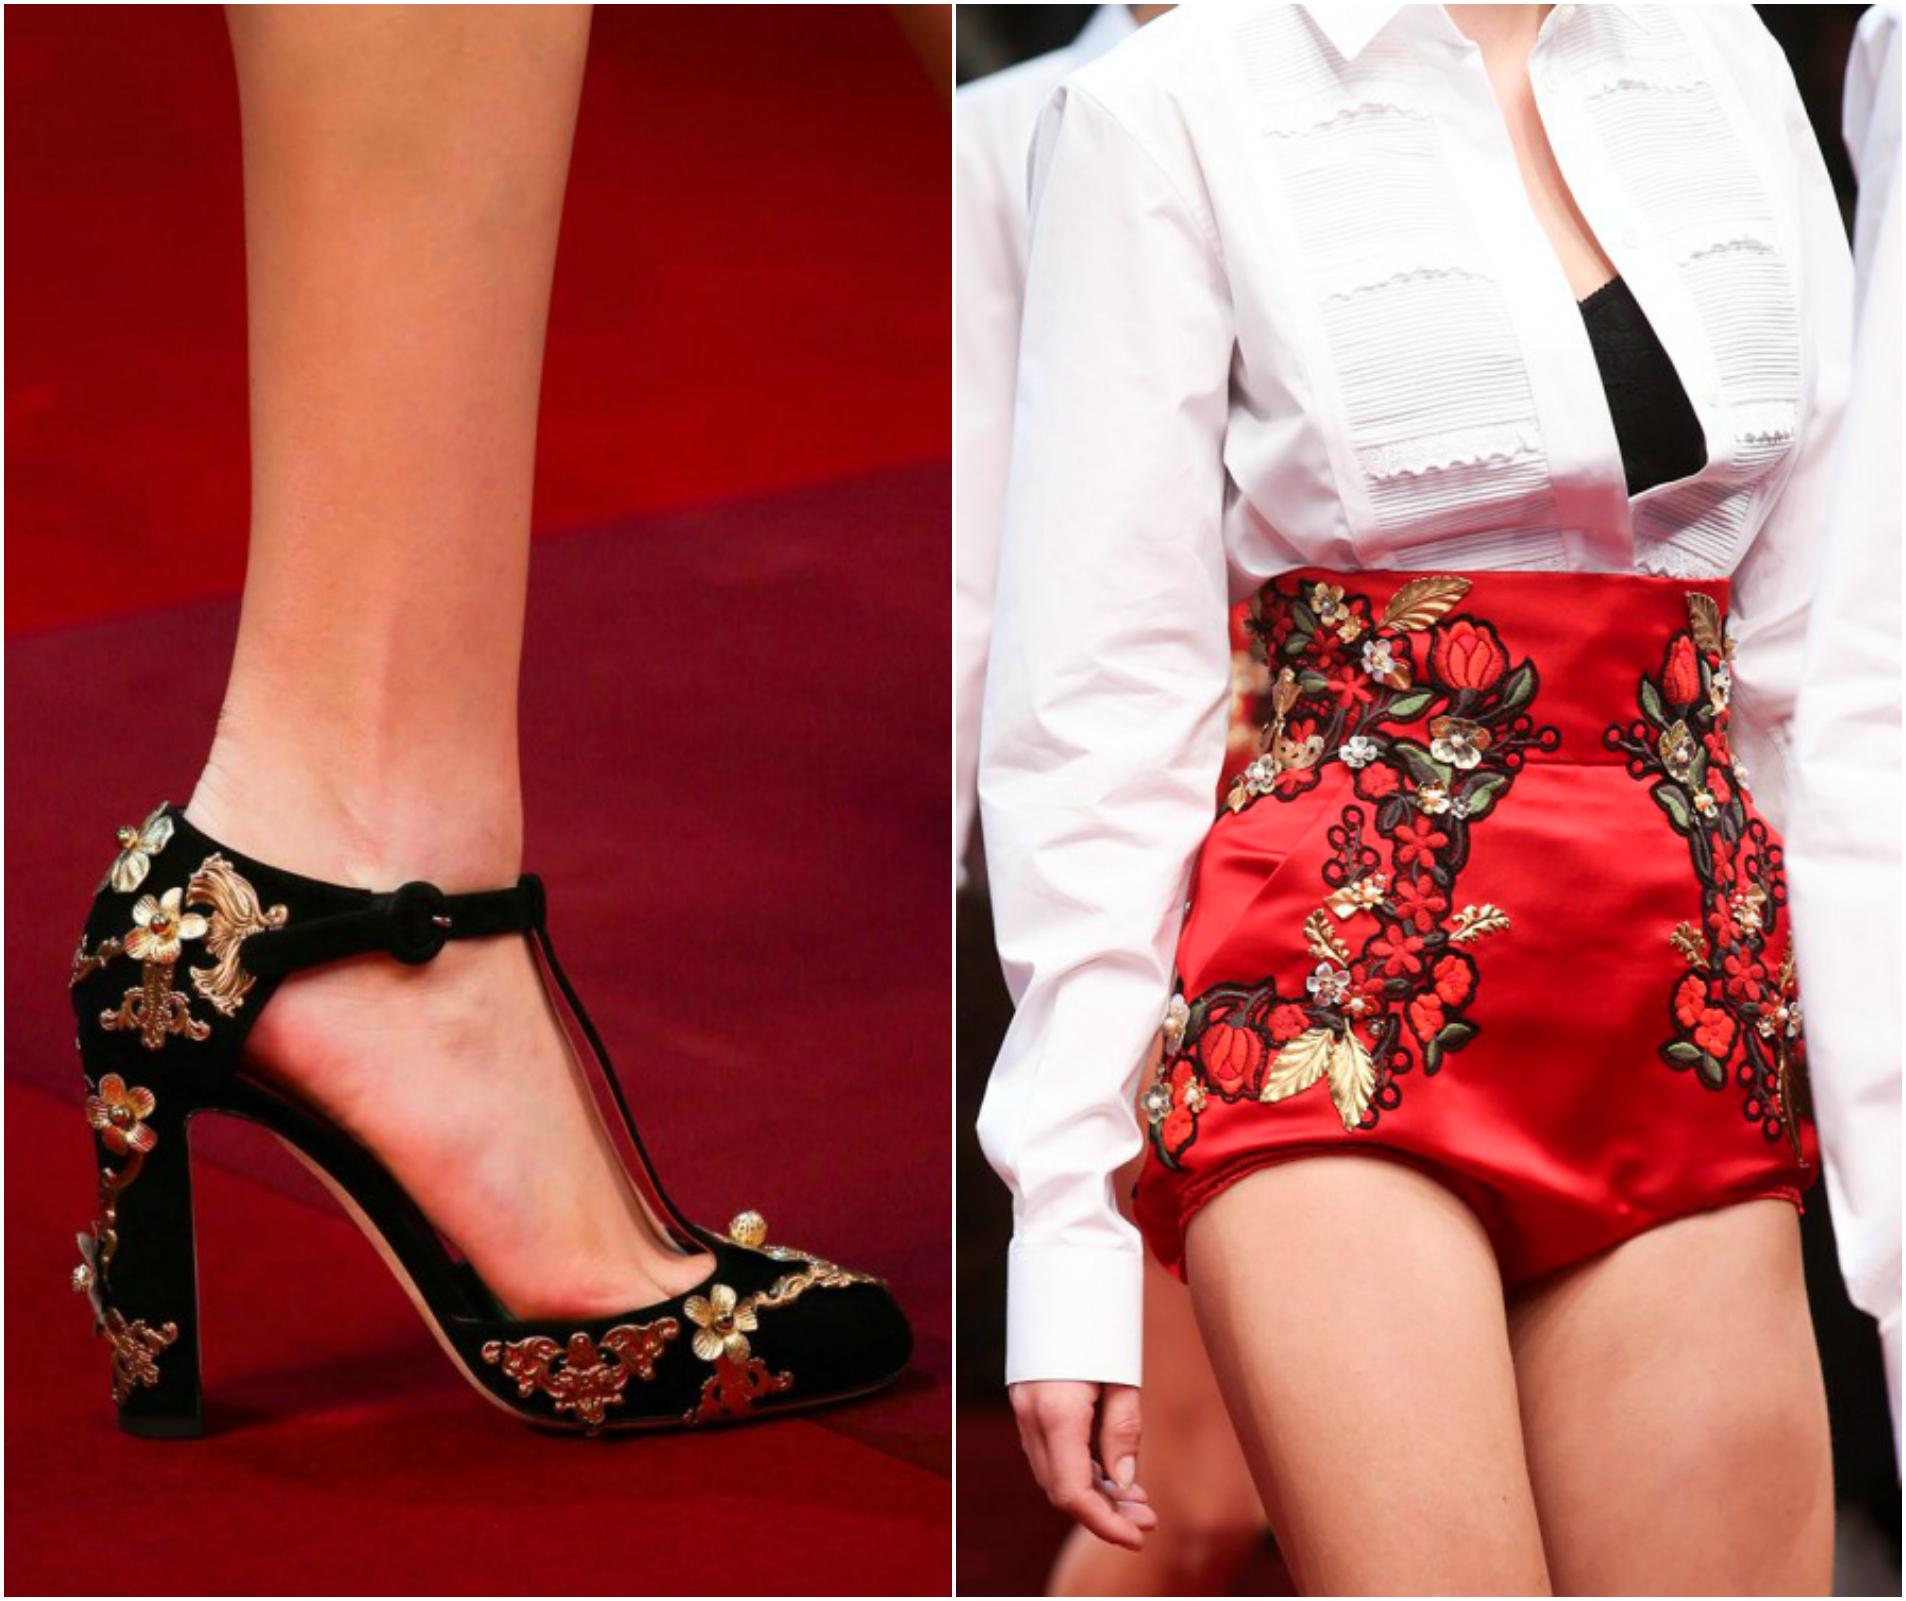 dolce gabbana heels matador